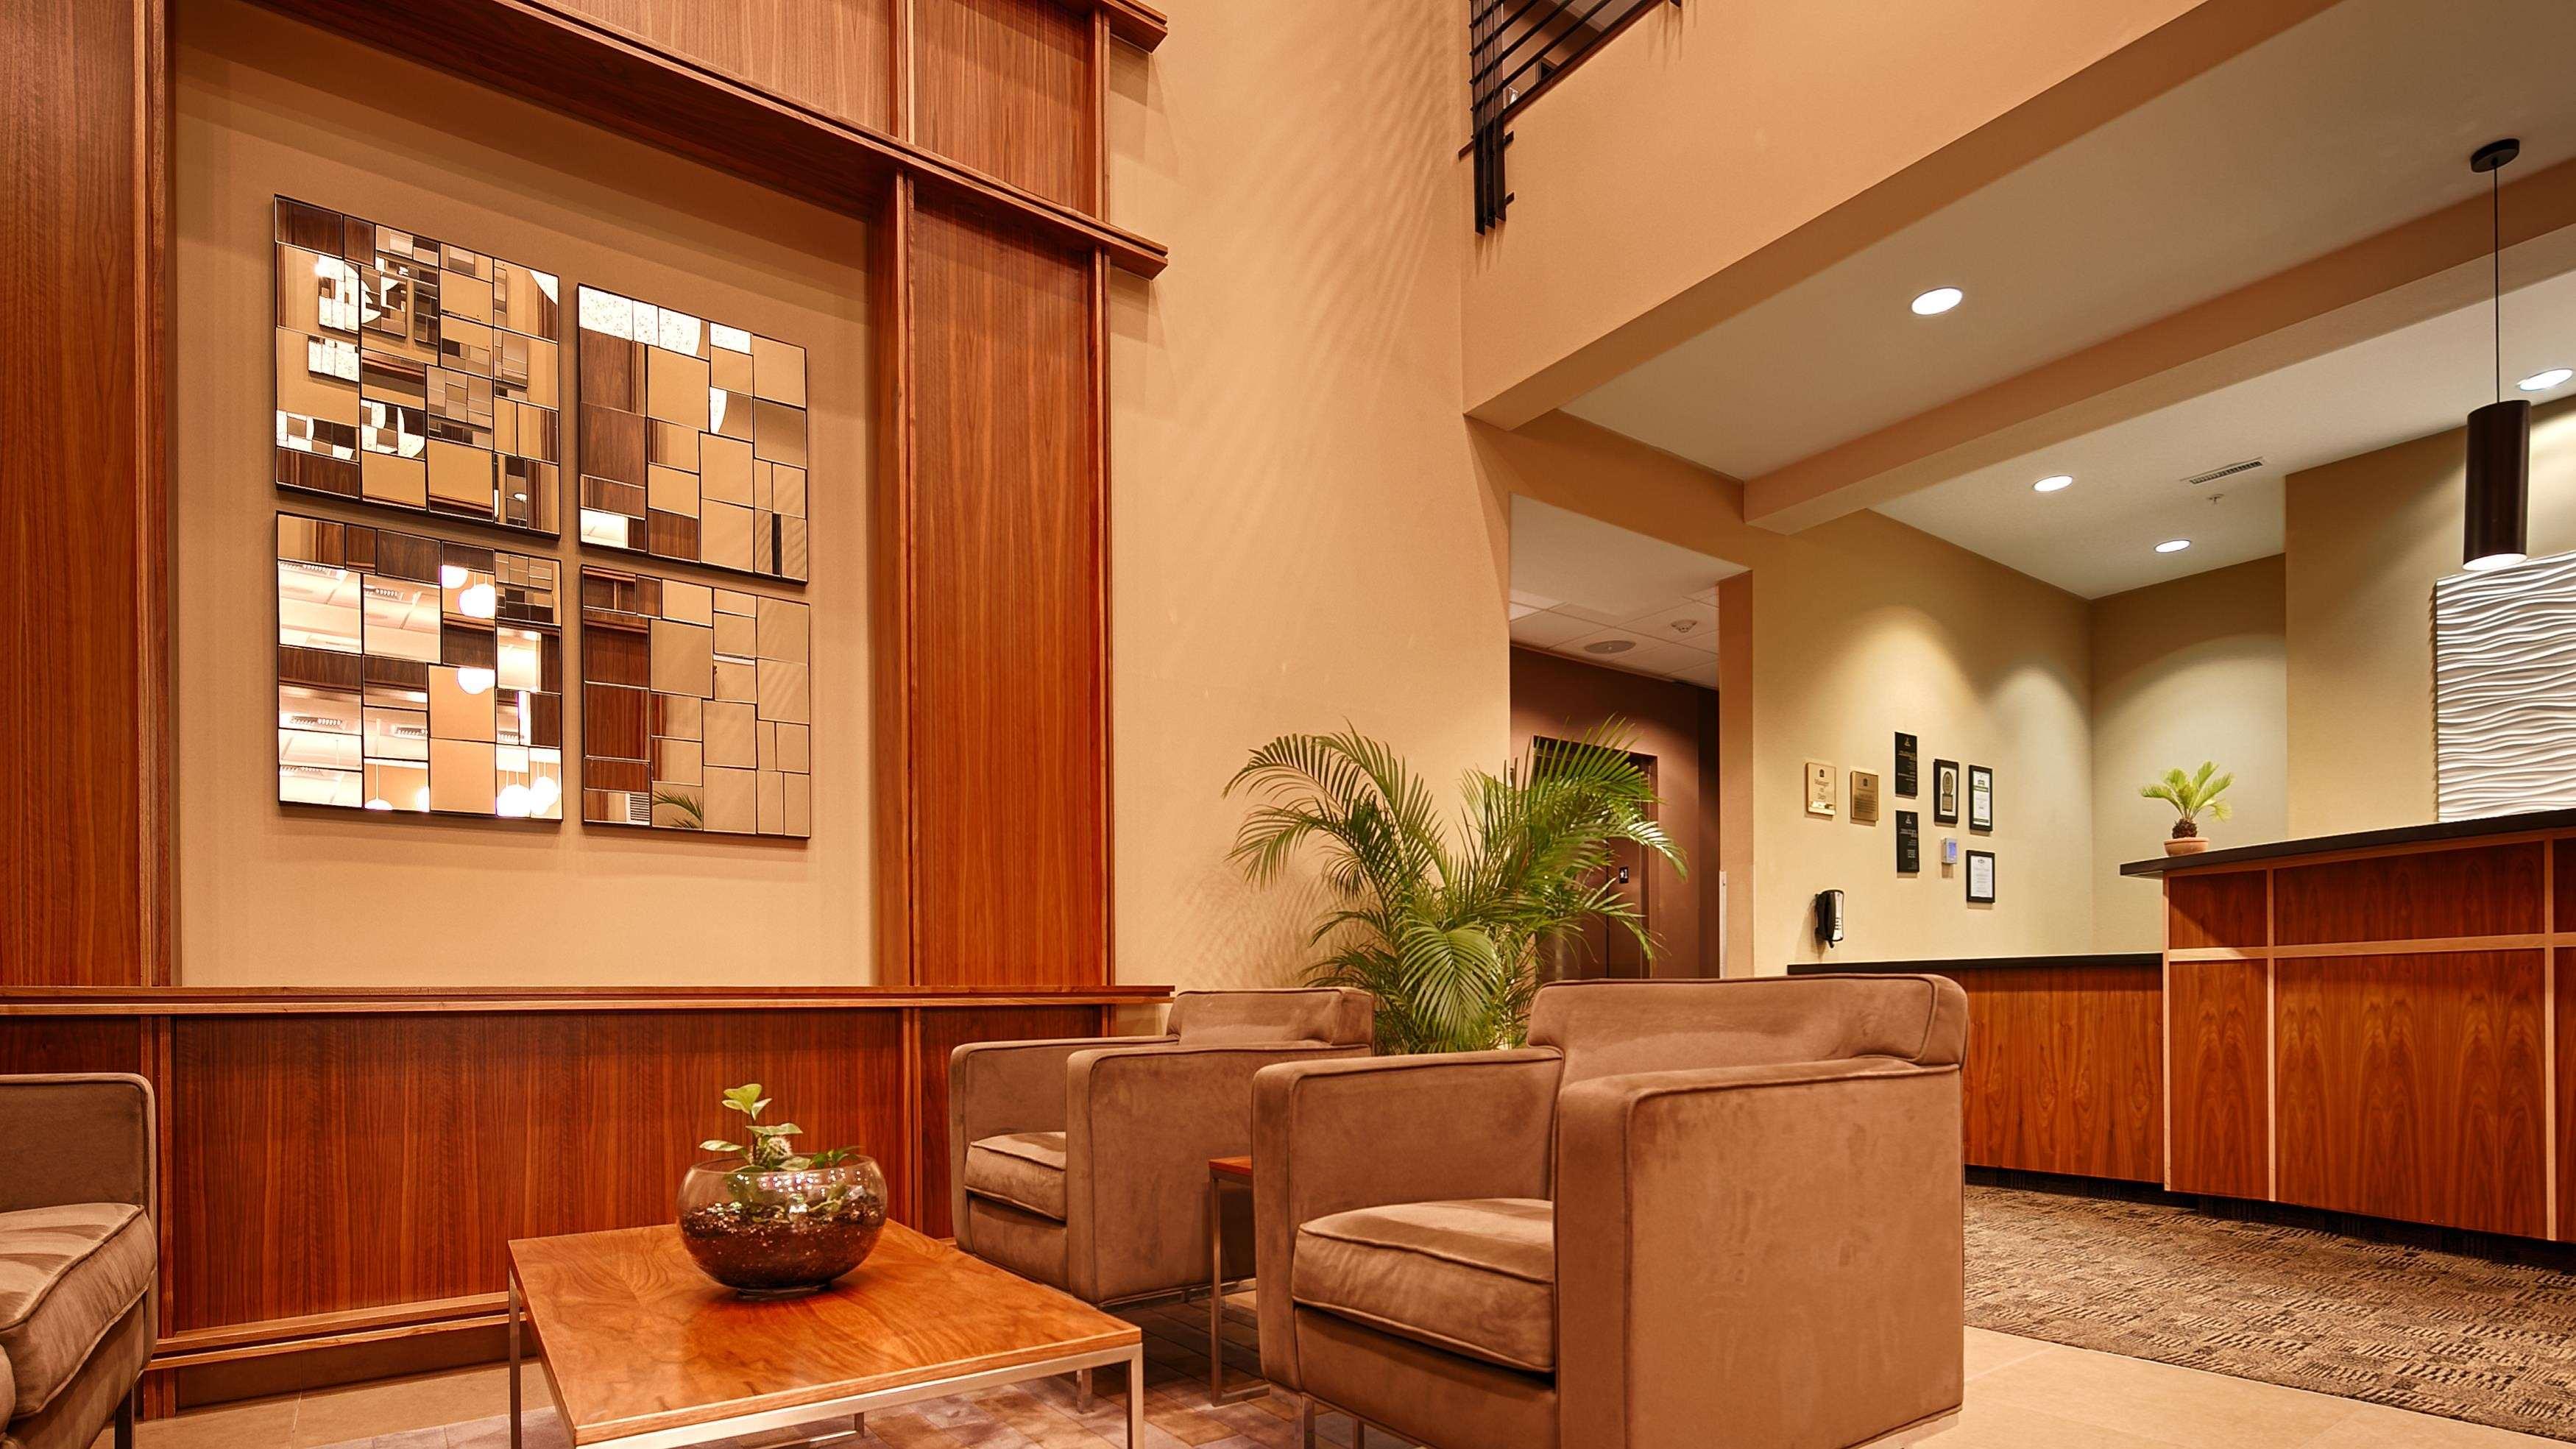 Best Western Plus Lacey Inn & Suites image 11